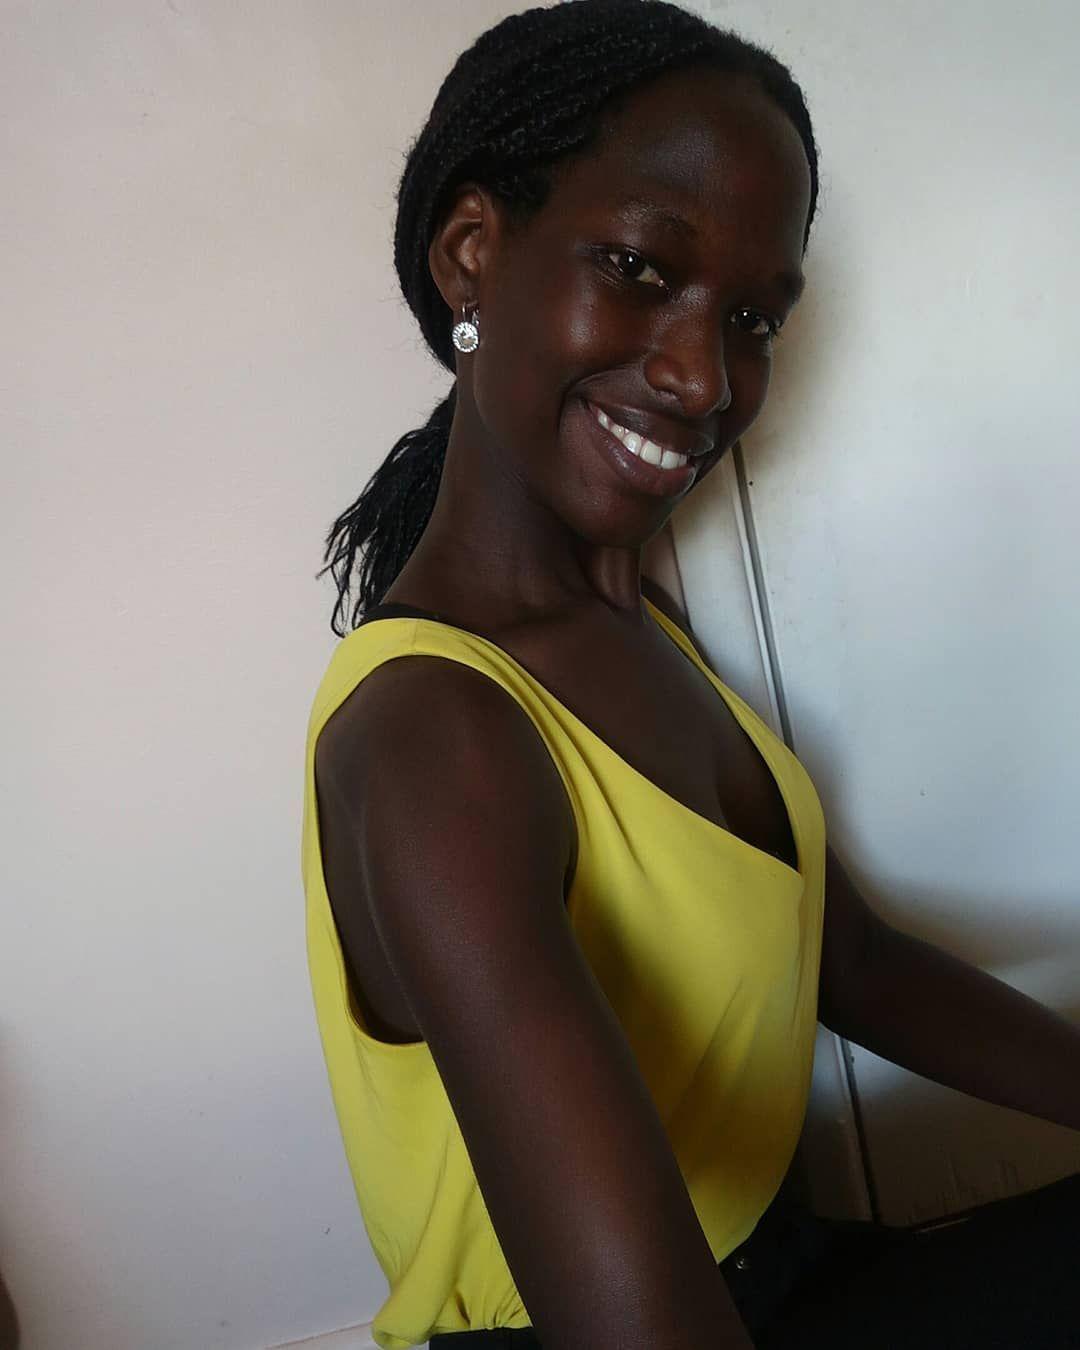 blackbeauty blackwomen melanin blackisbeautiful blackgirlmagic